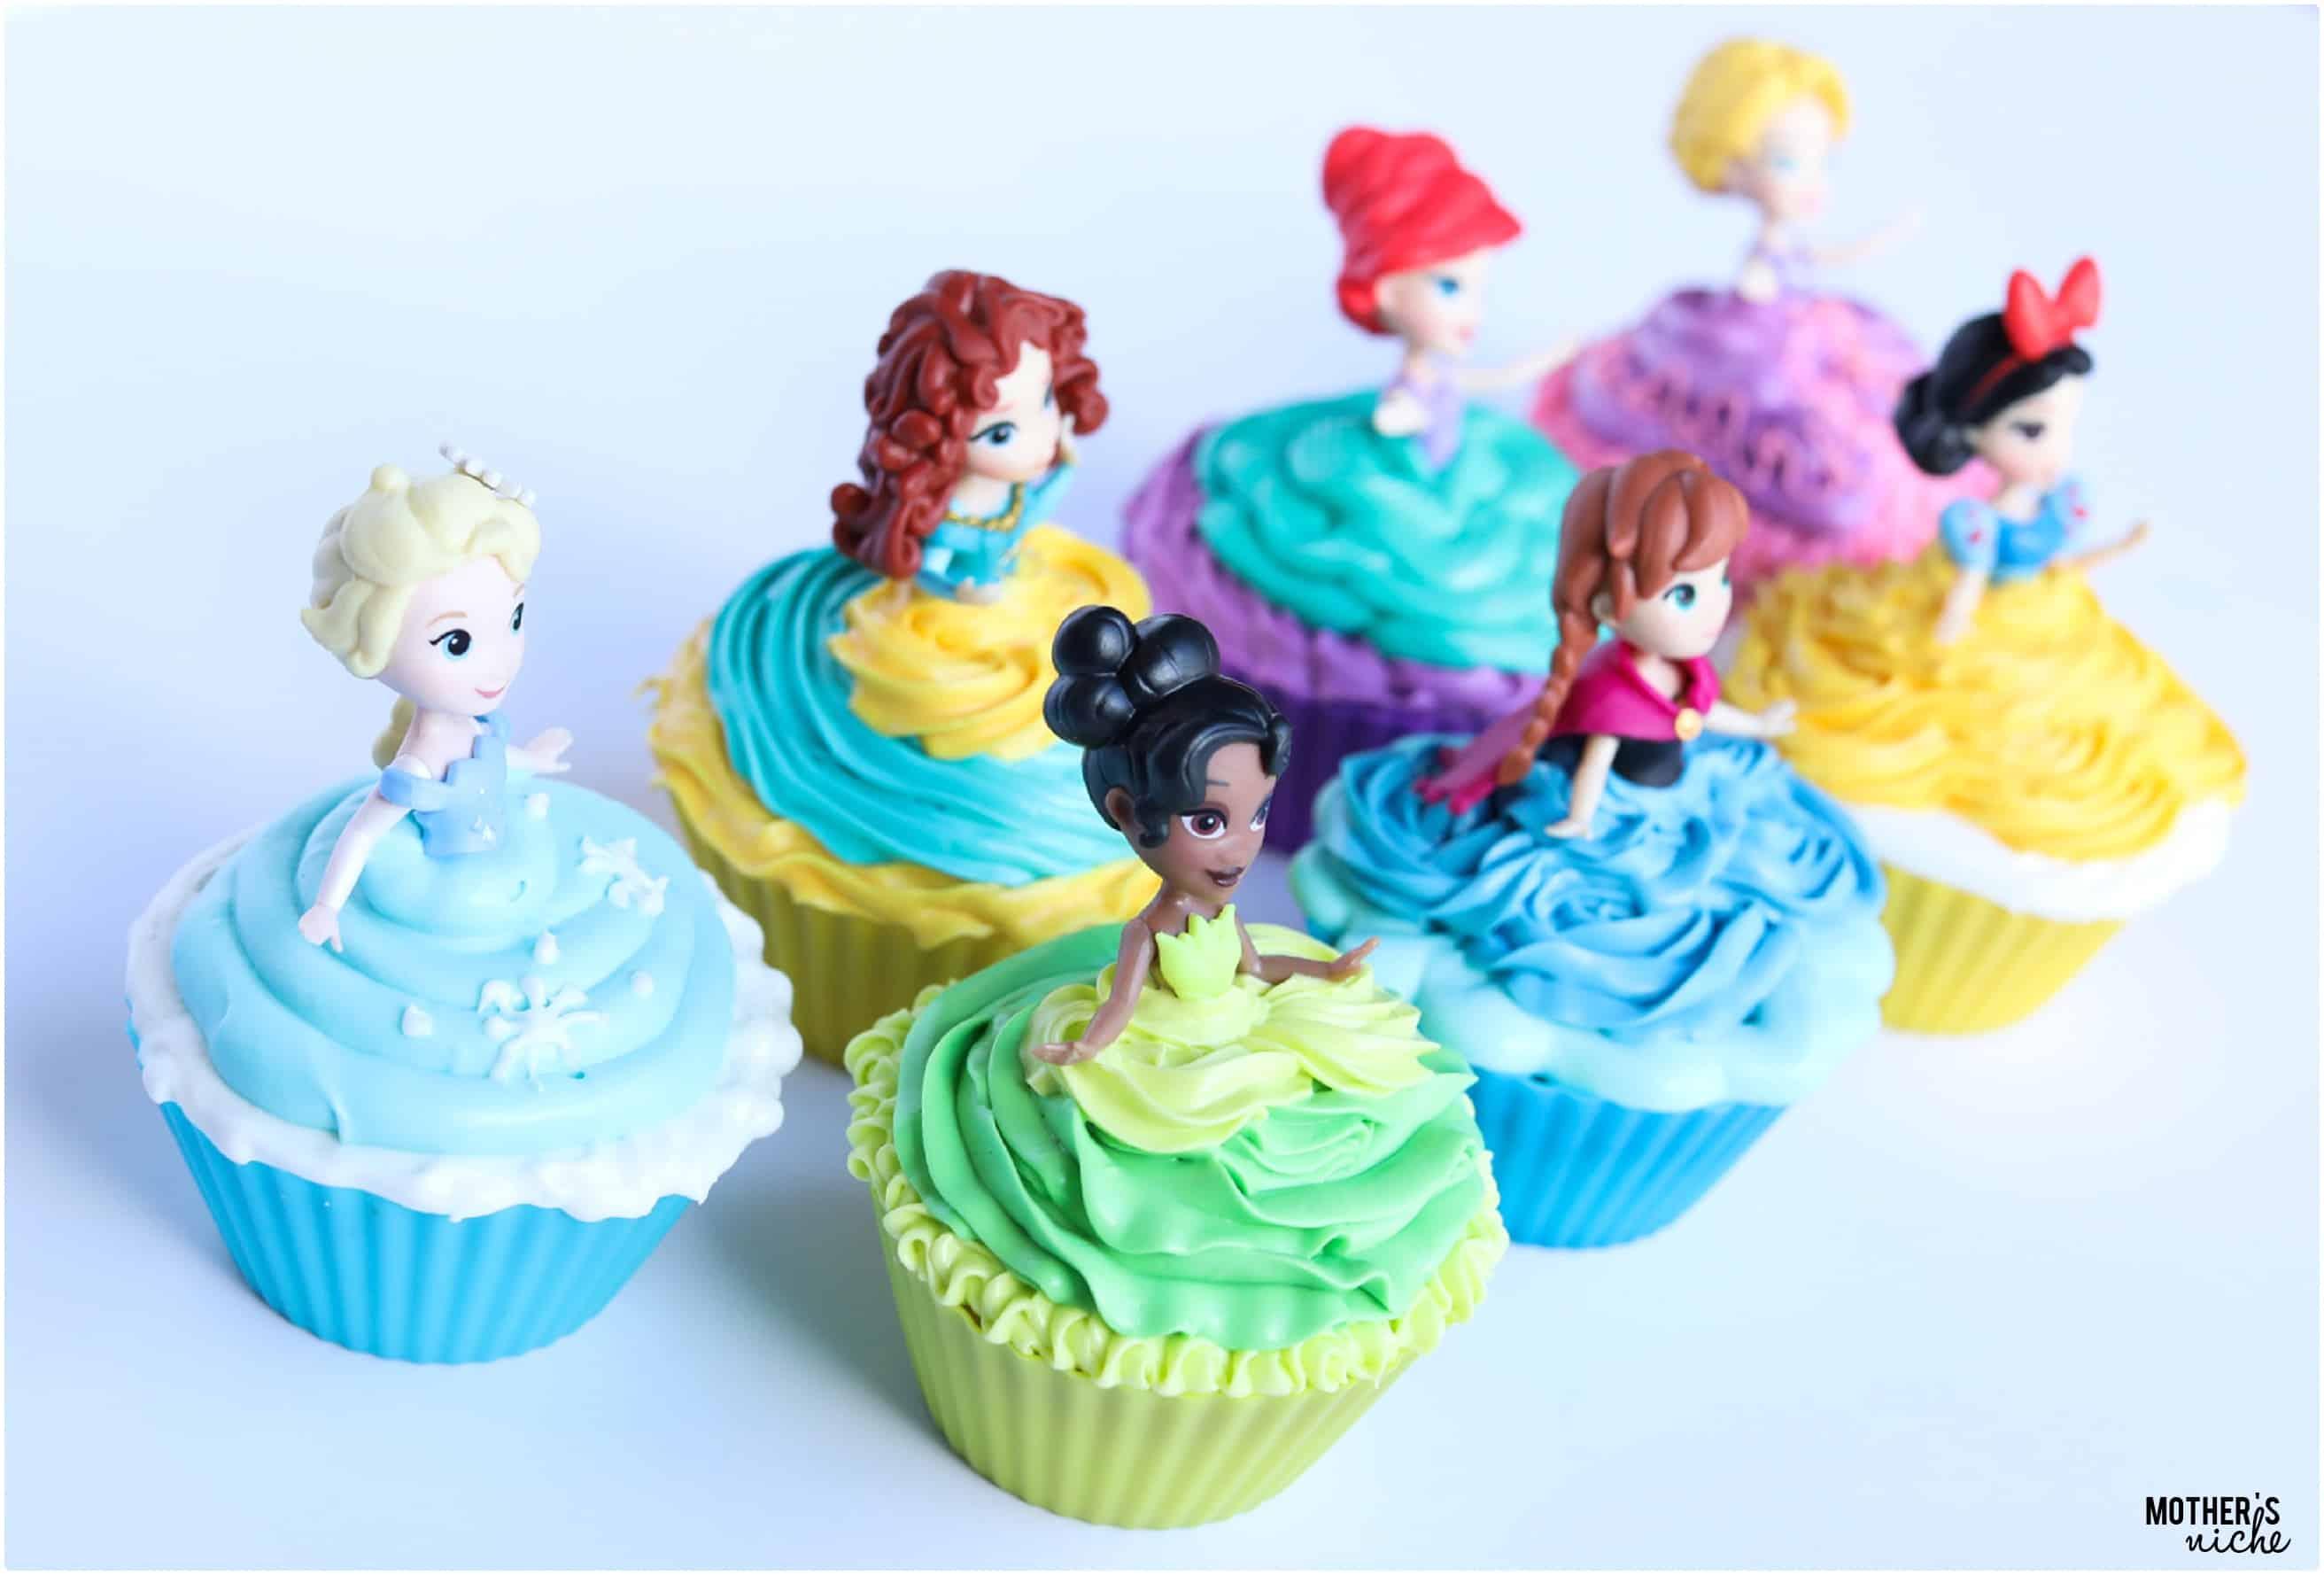 Princess Cupcakes Easy Disney Princess Cupcakes with a Video Tutorial